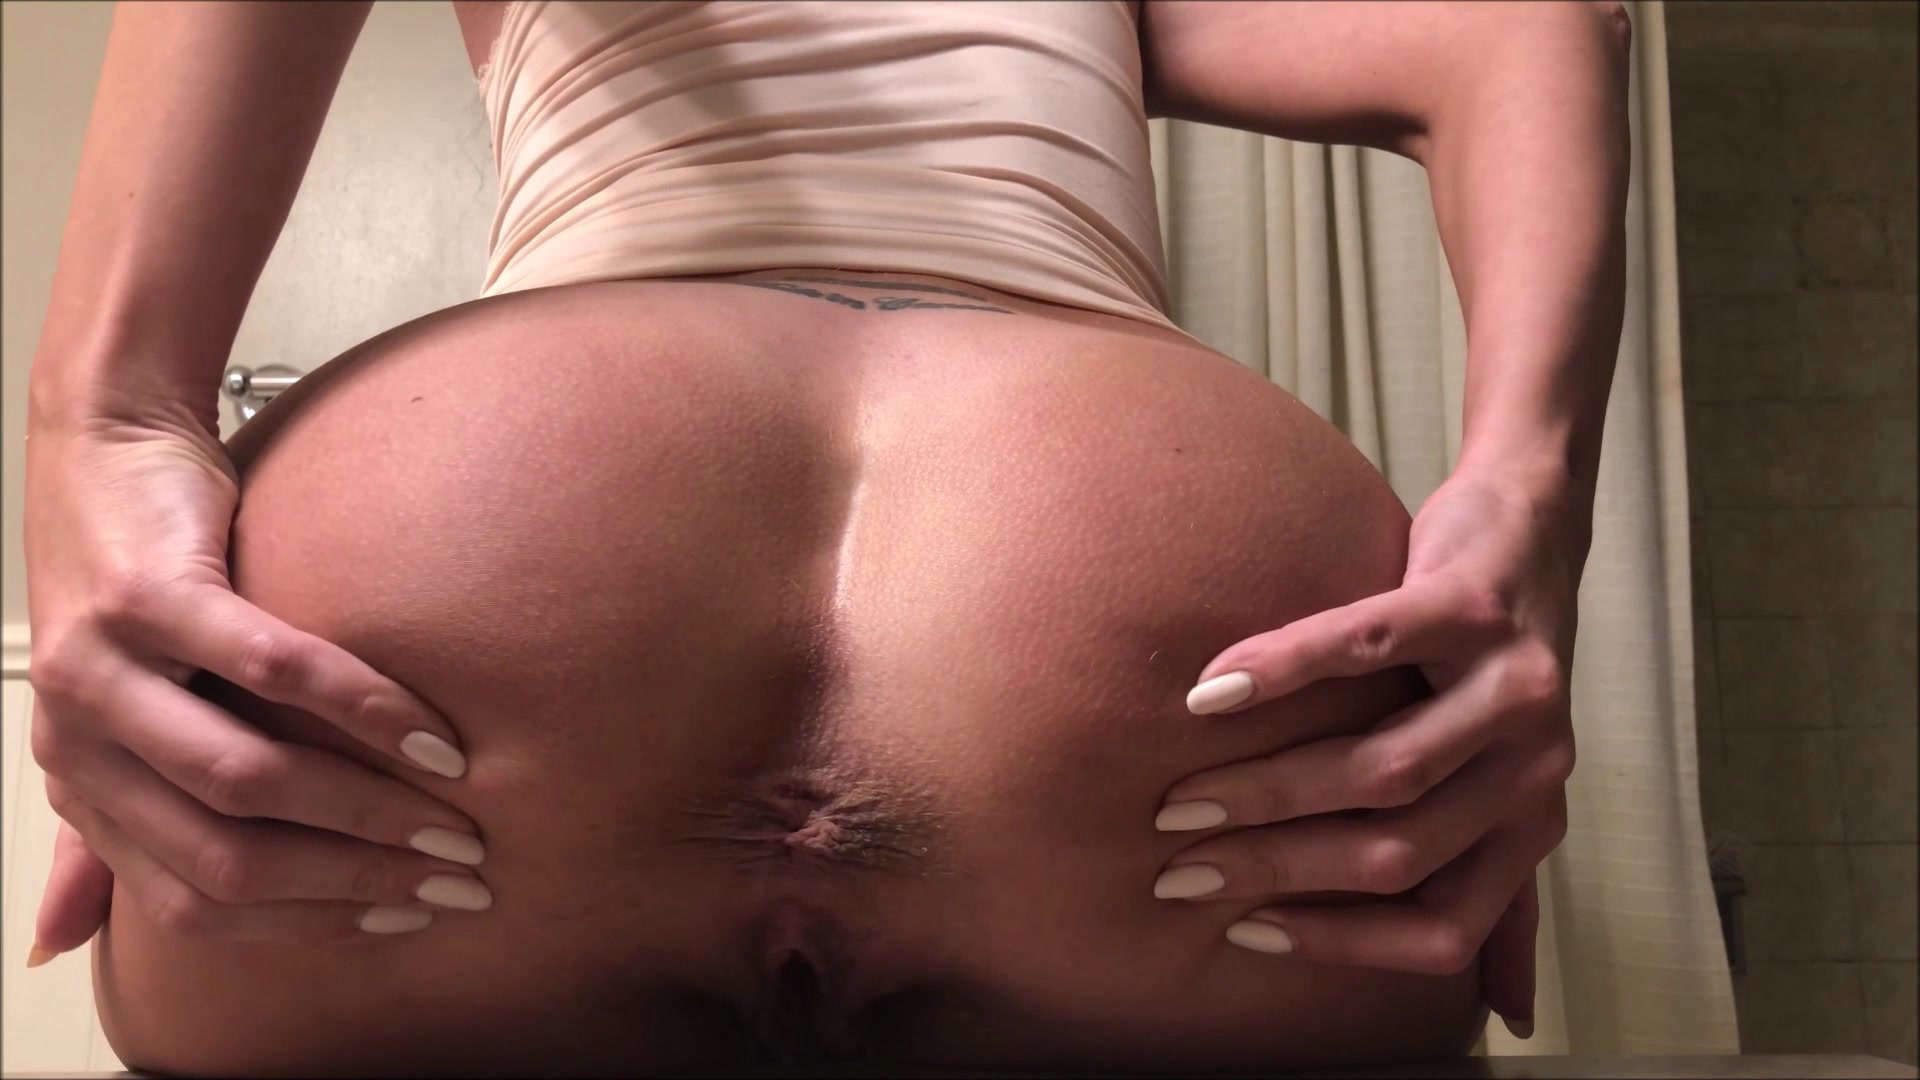 Tina_Amazon_-_Counter_Poop_Close_Up_With_Farts_-_1080p.00000.jpg